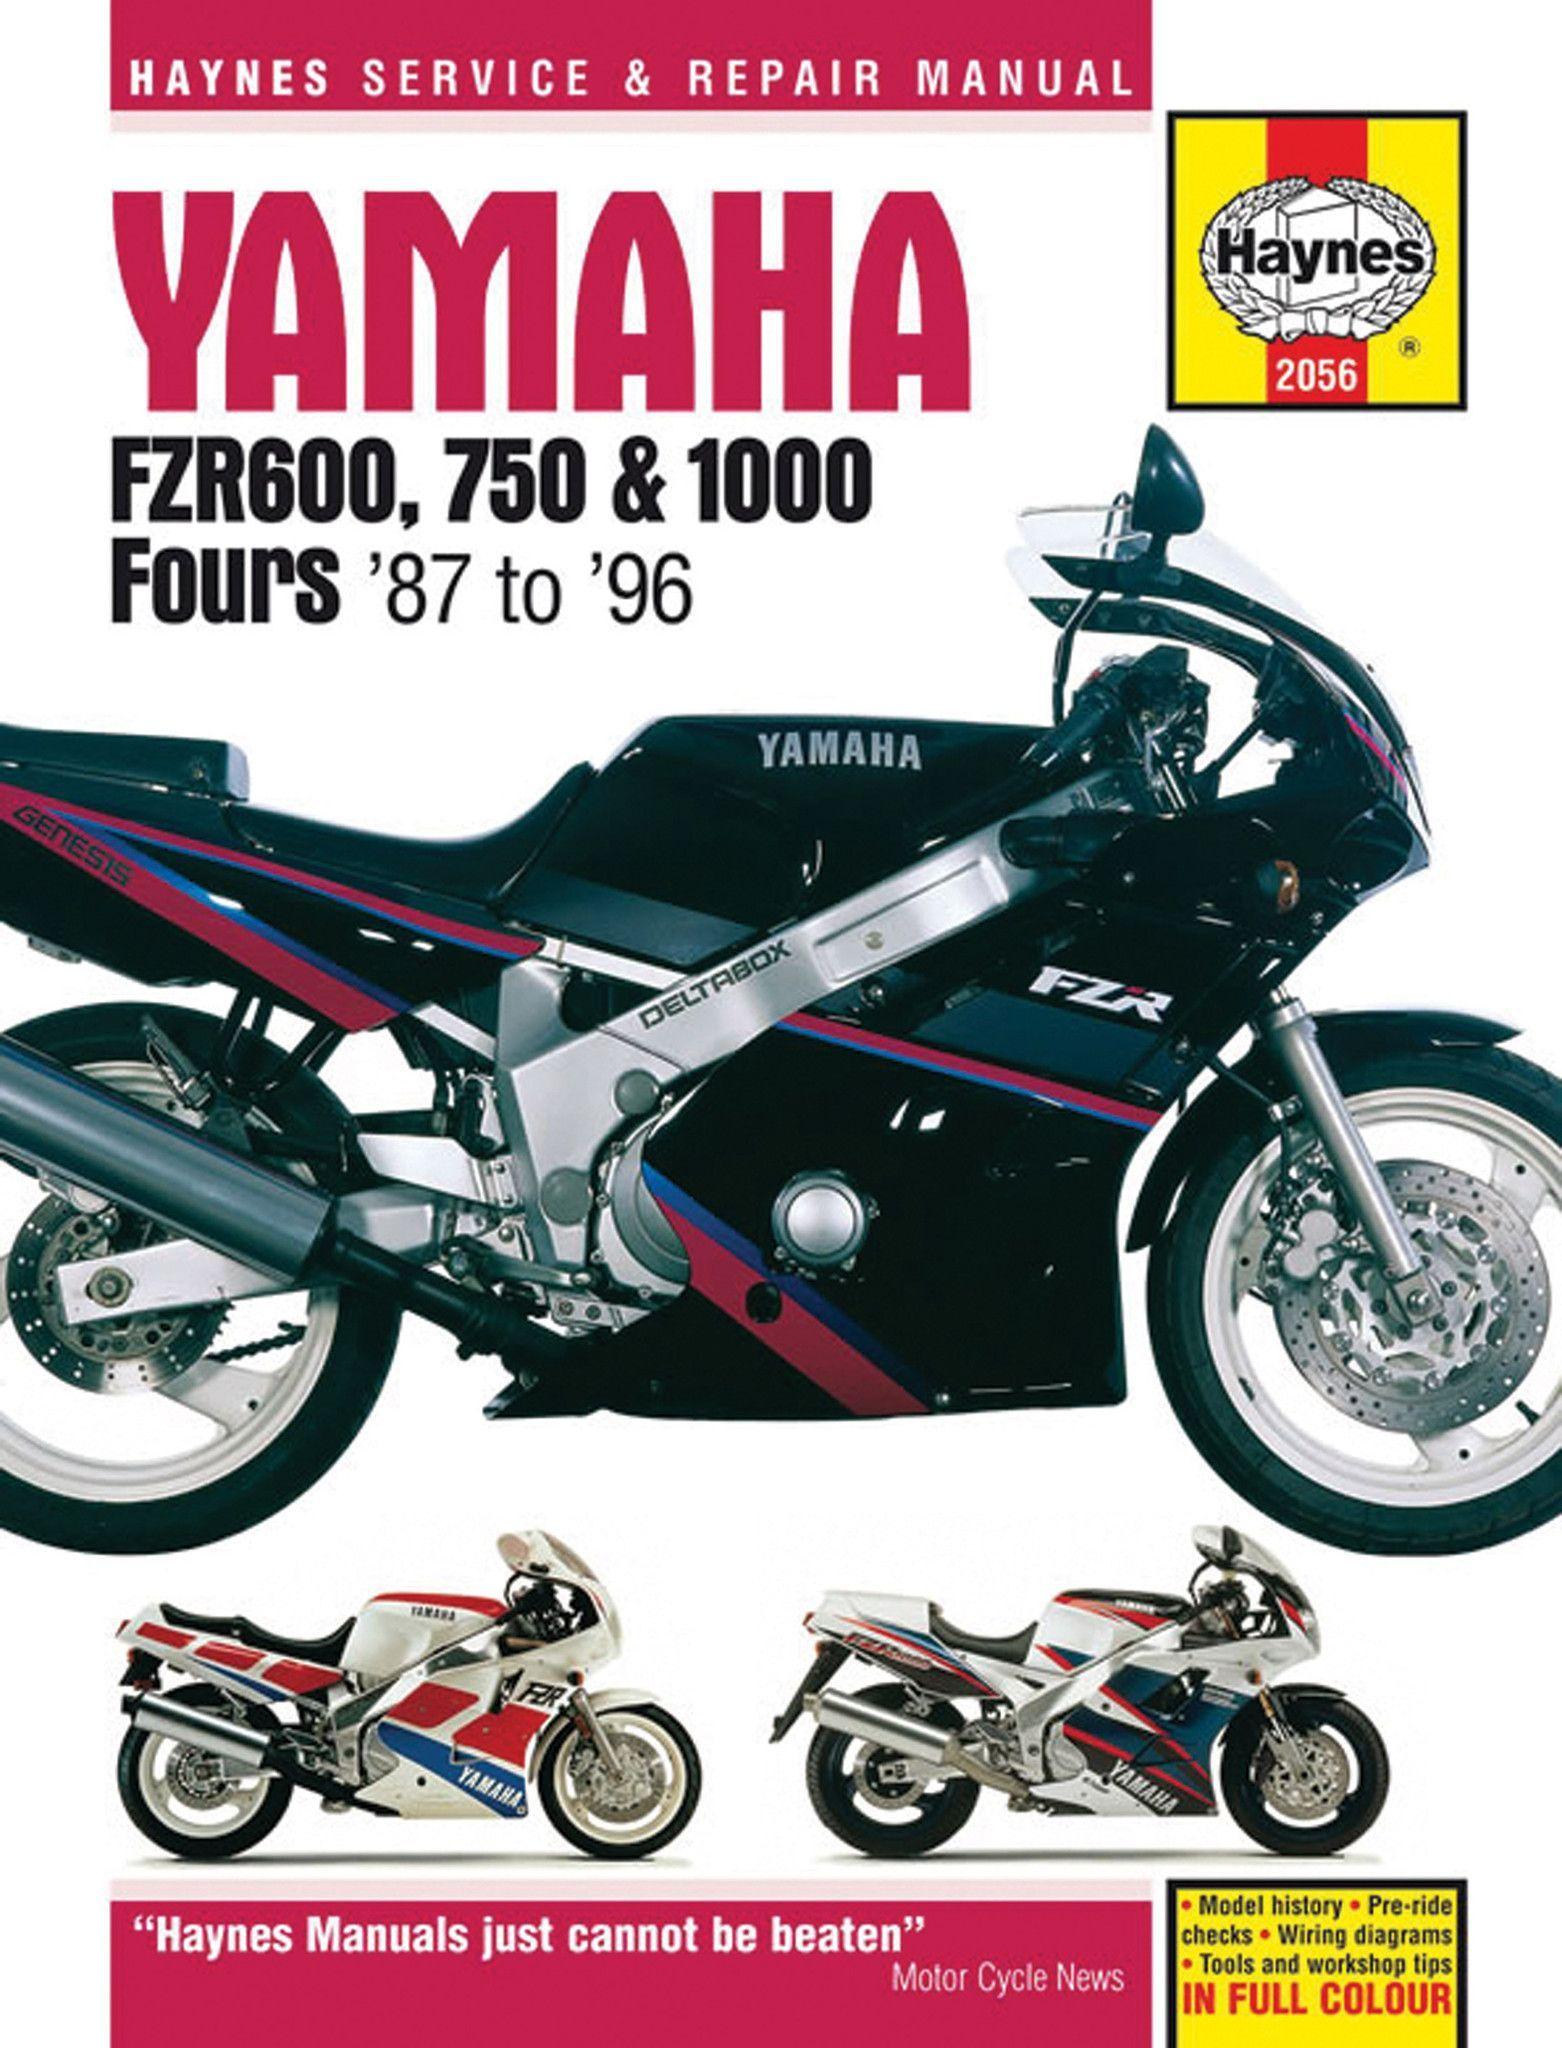 medium resolution of haynes service manual for yamaha fzr600 fzr750 fzr1000 m2056 wiring diagram needed for 1989 yamaha fzr1000 genesis